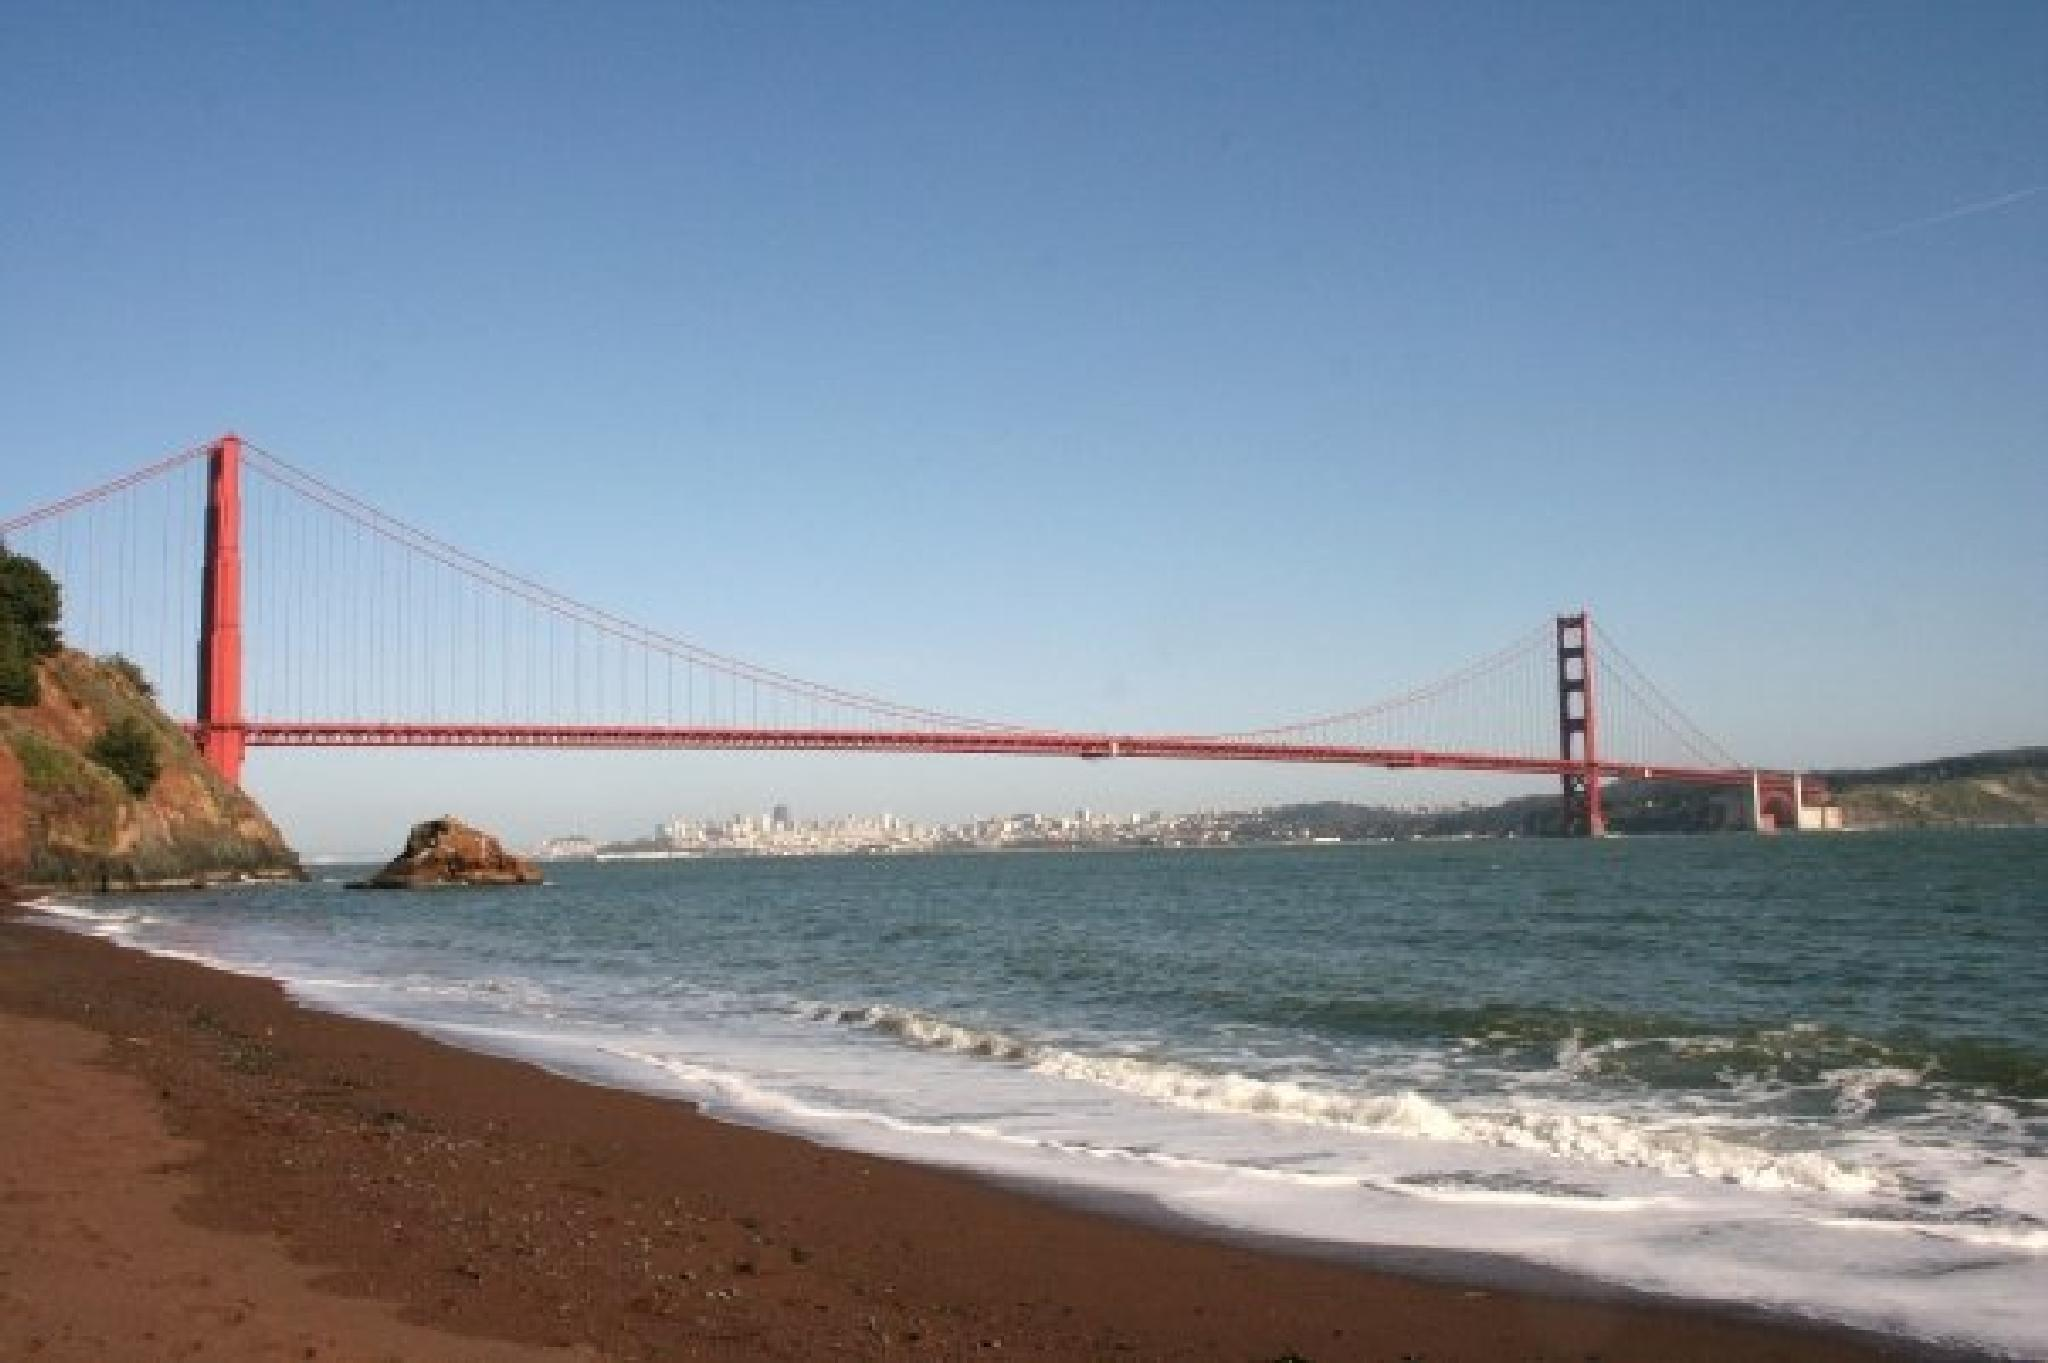 Golden Gate Bridge by Julia Mae